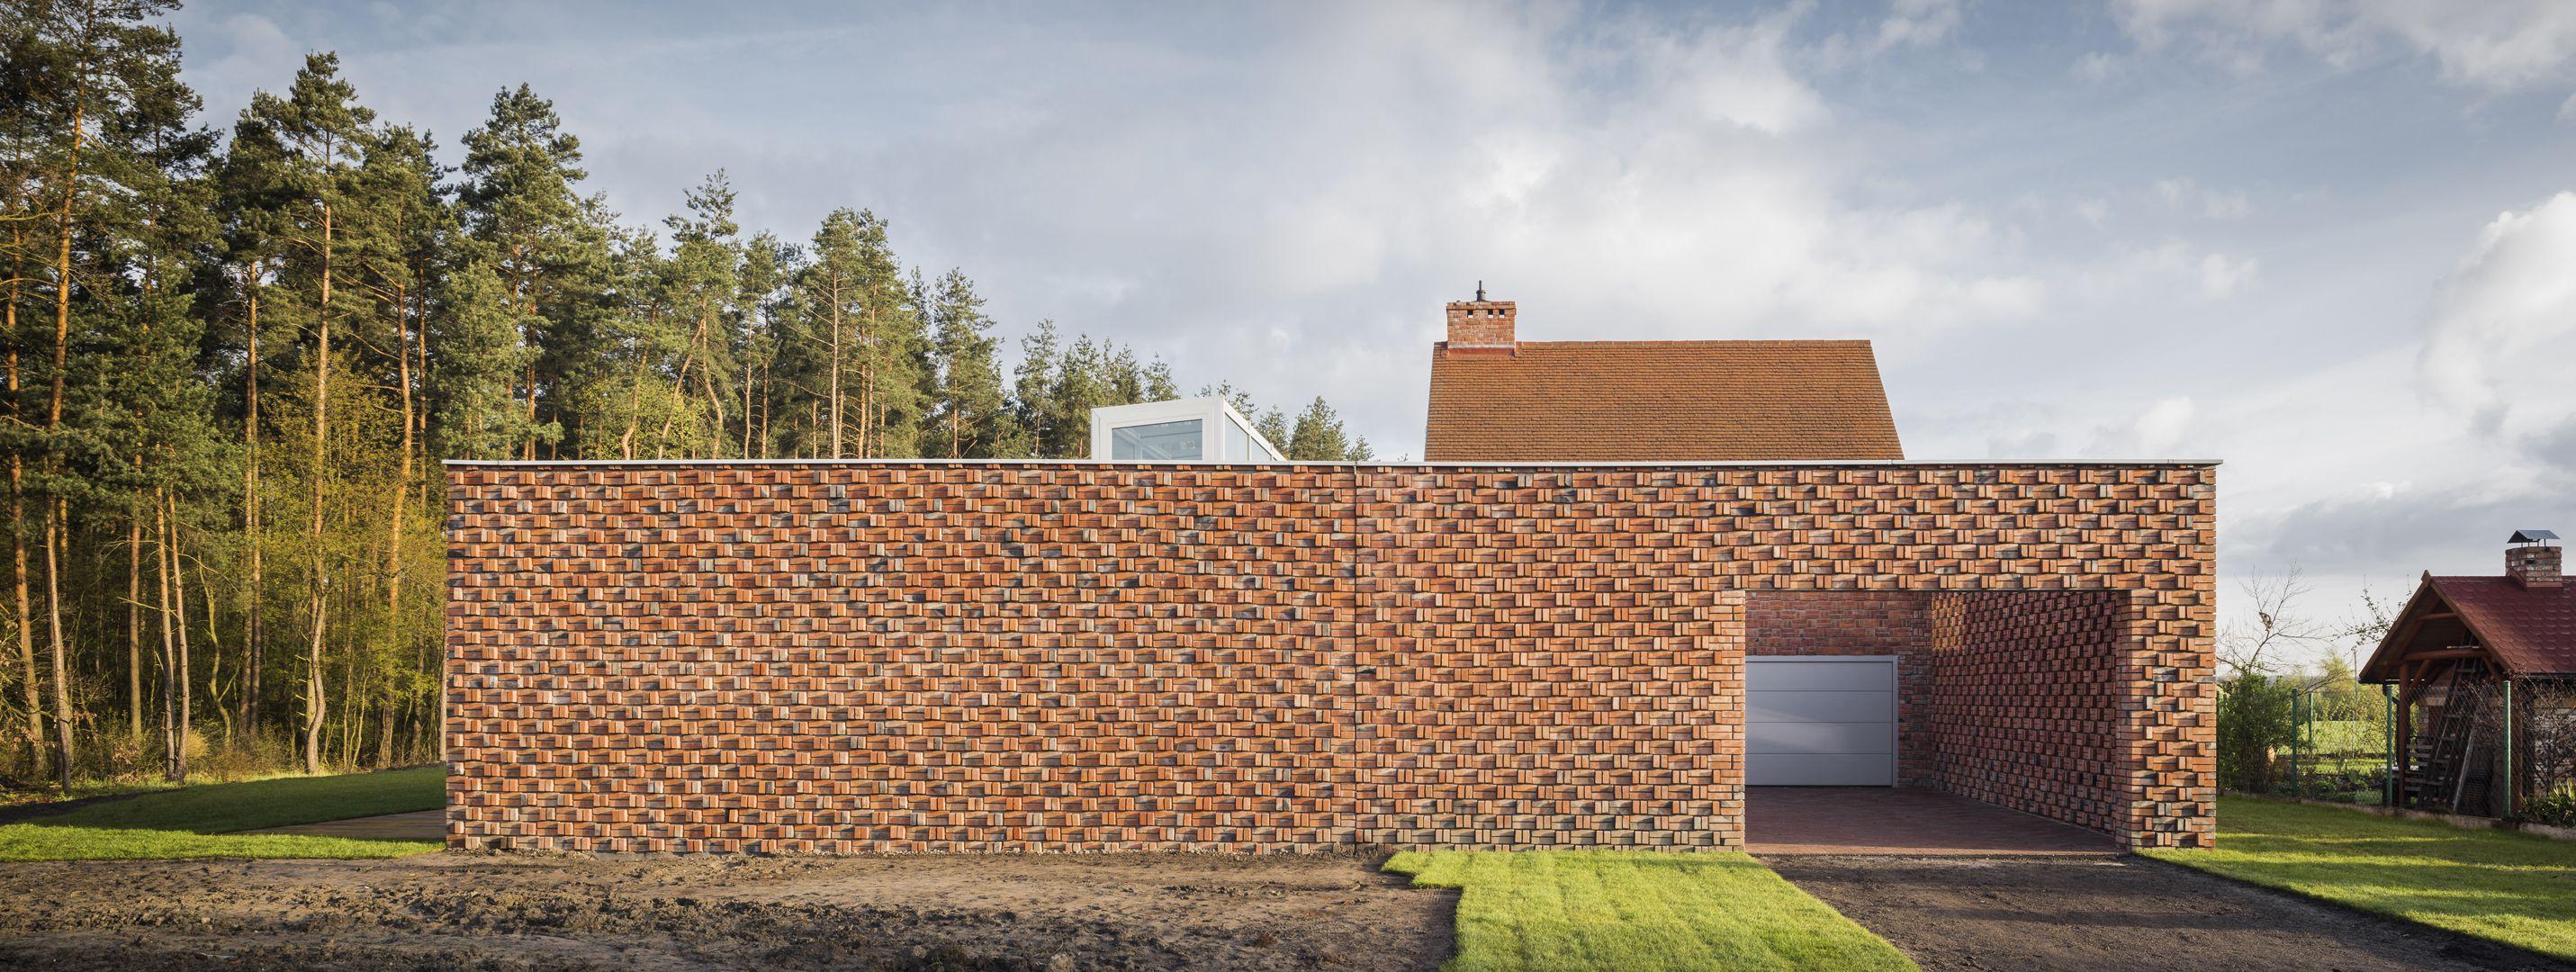 Photo 11 of 12 in Mesmerizing Brickwork Wraps This House in Poland